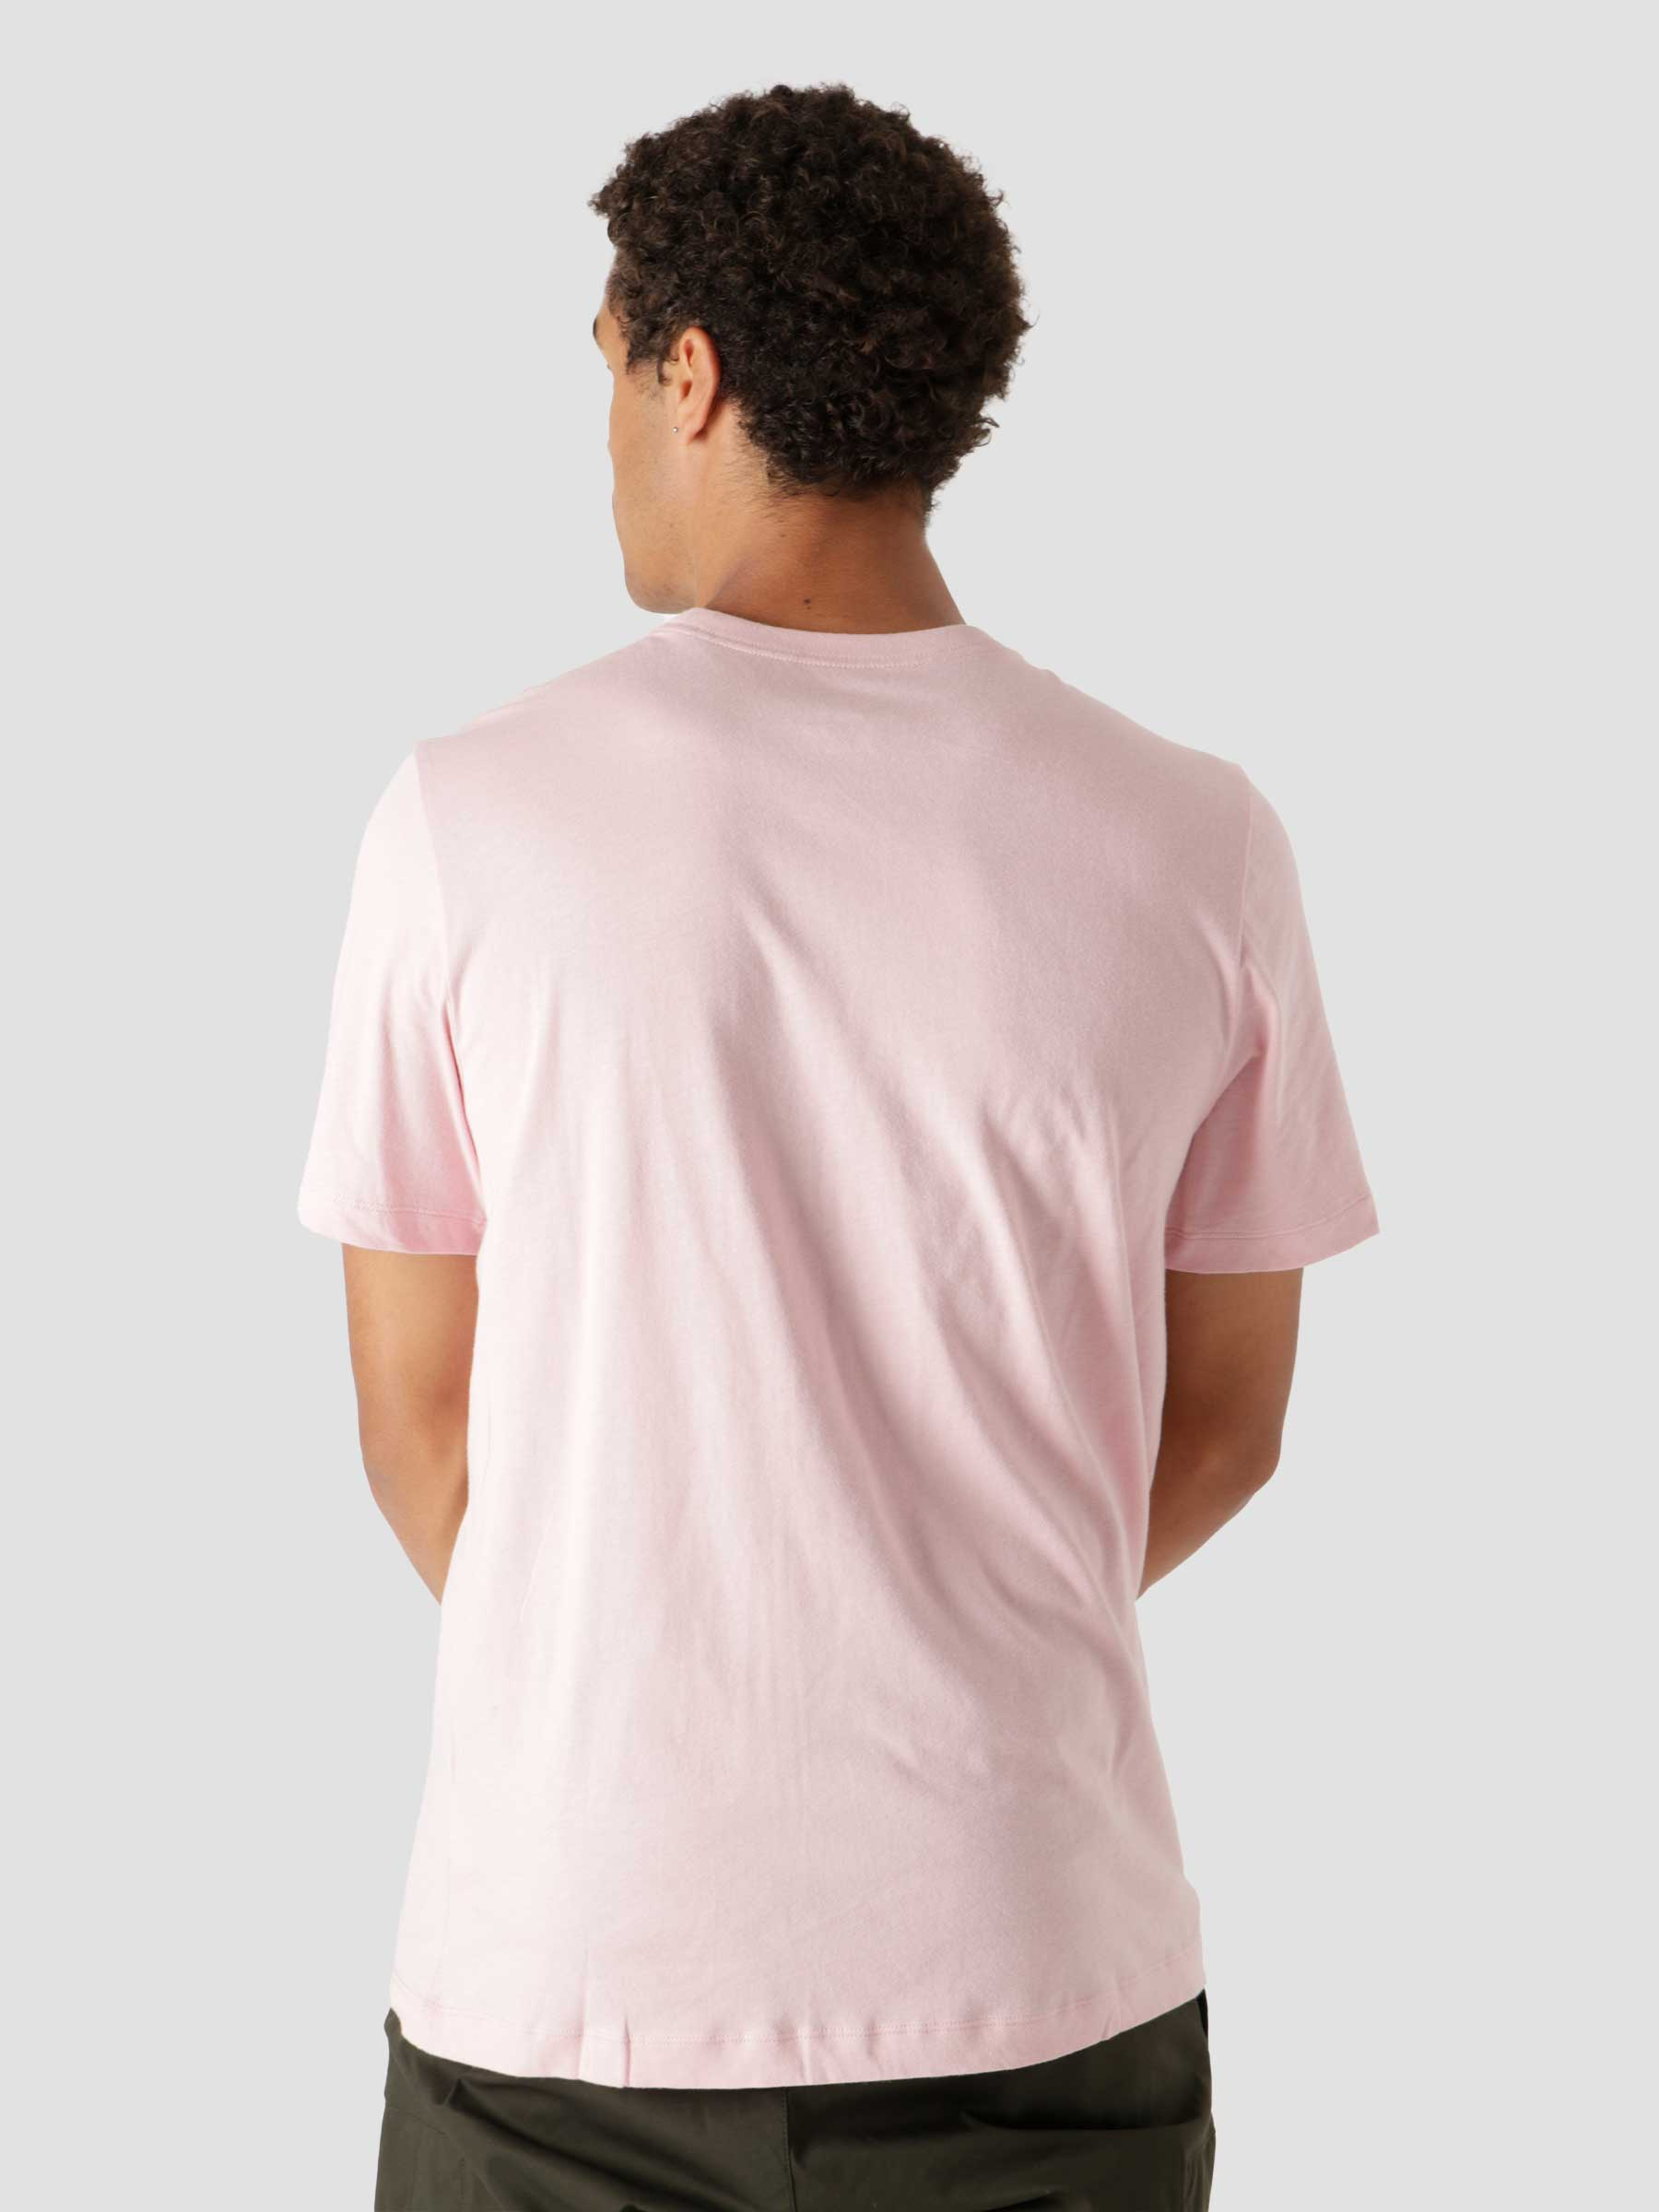 M Nsw Club T Shirt Pink Glaze Black AR4997-630